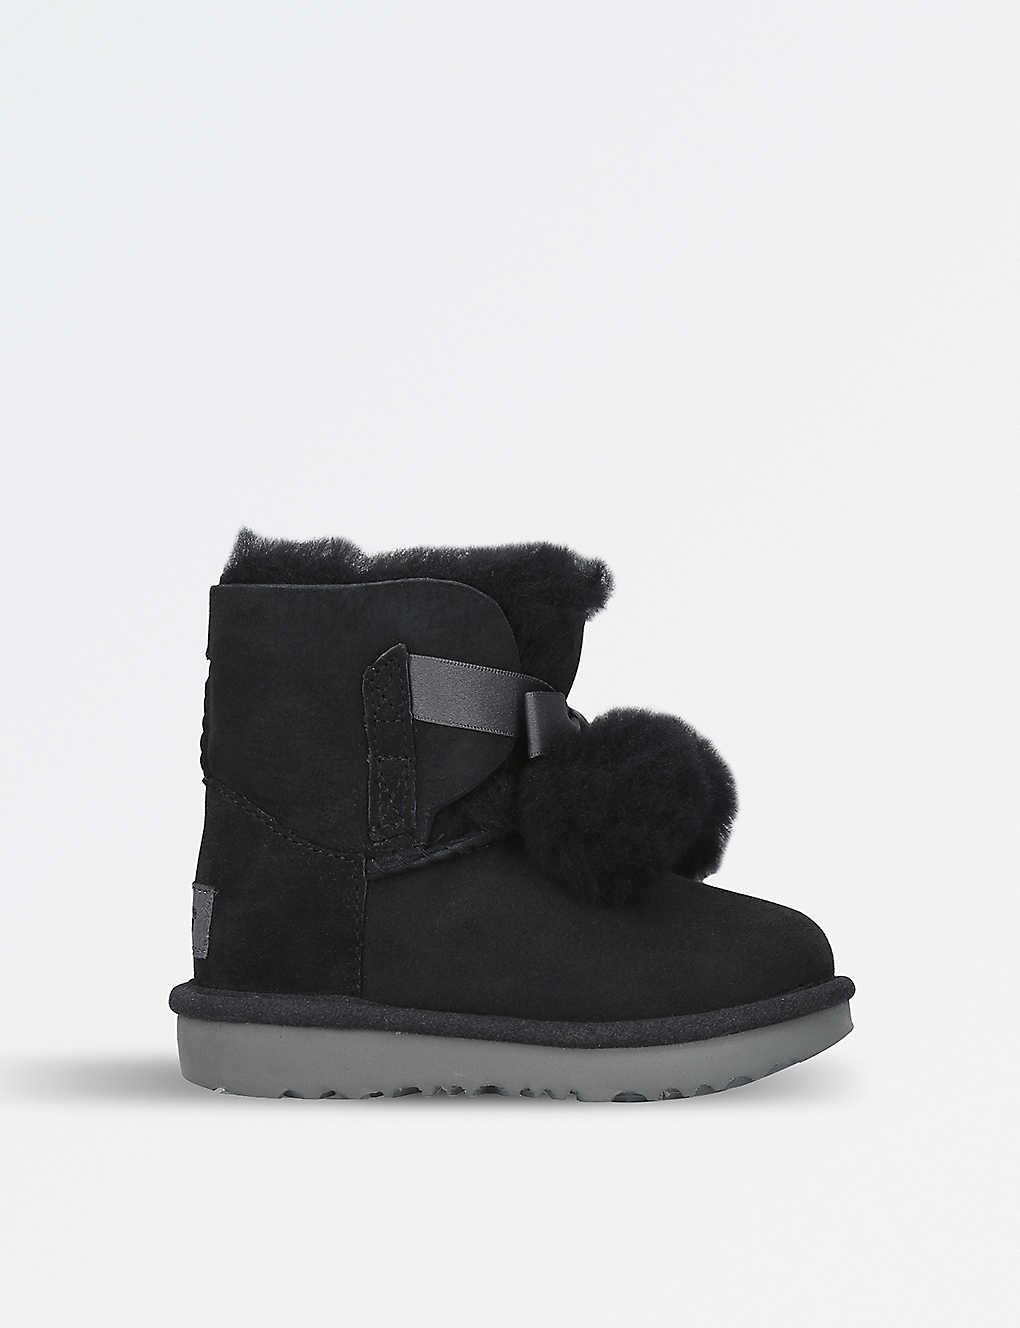 5d9fd2985d0 UGG - Gita pom pom sheepskin boots 3-7 years | Selfridges.com